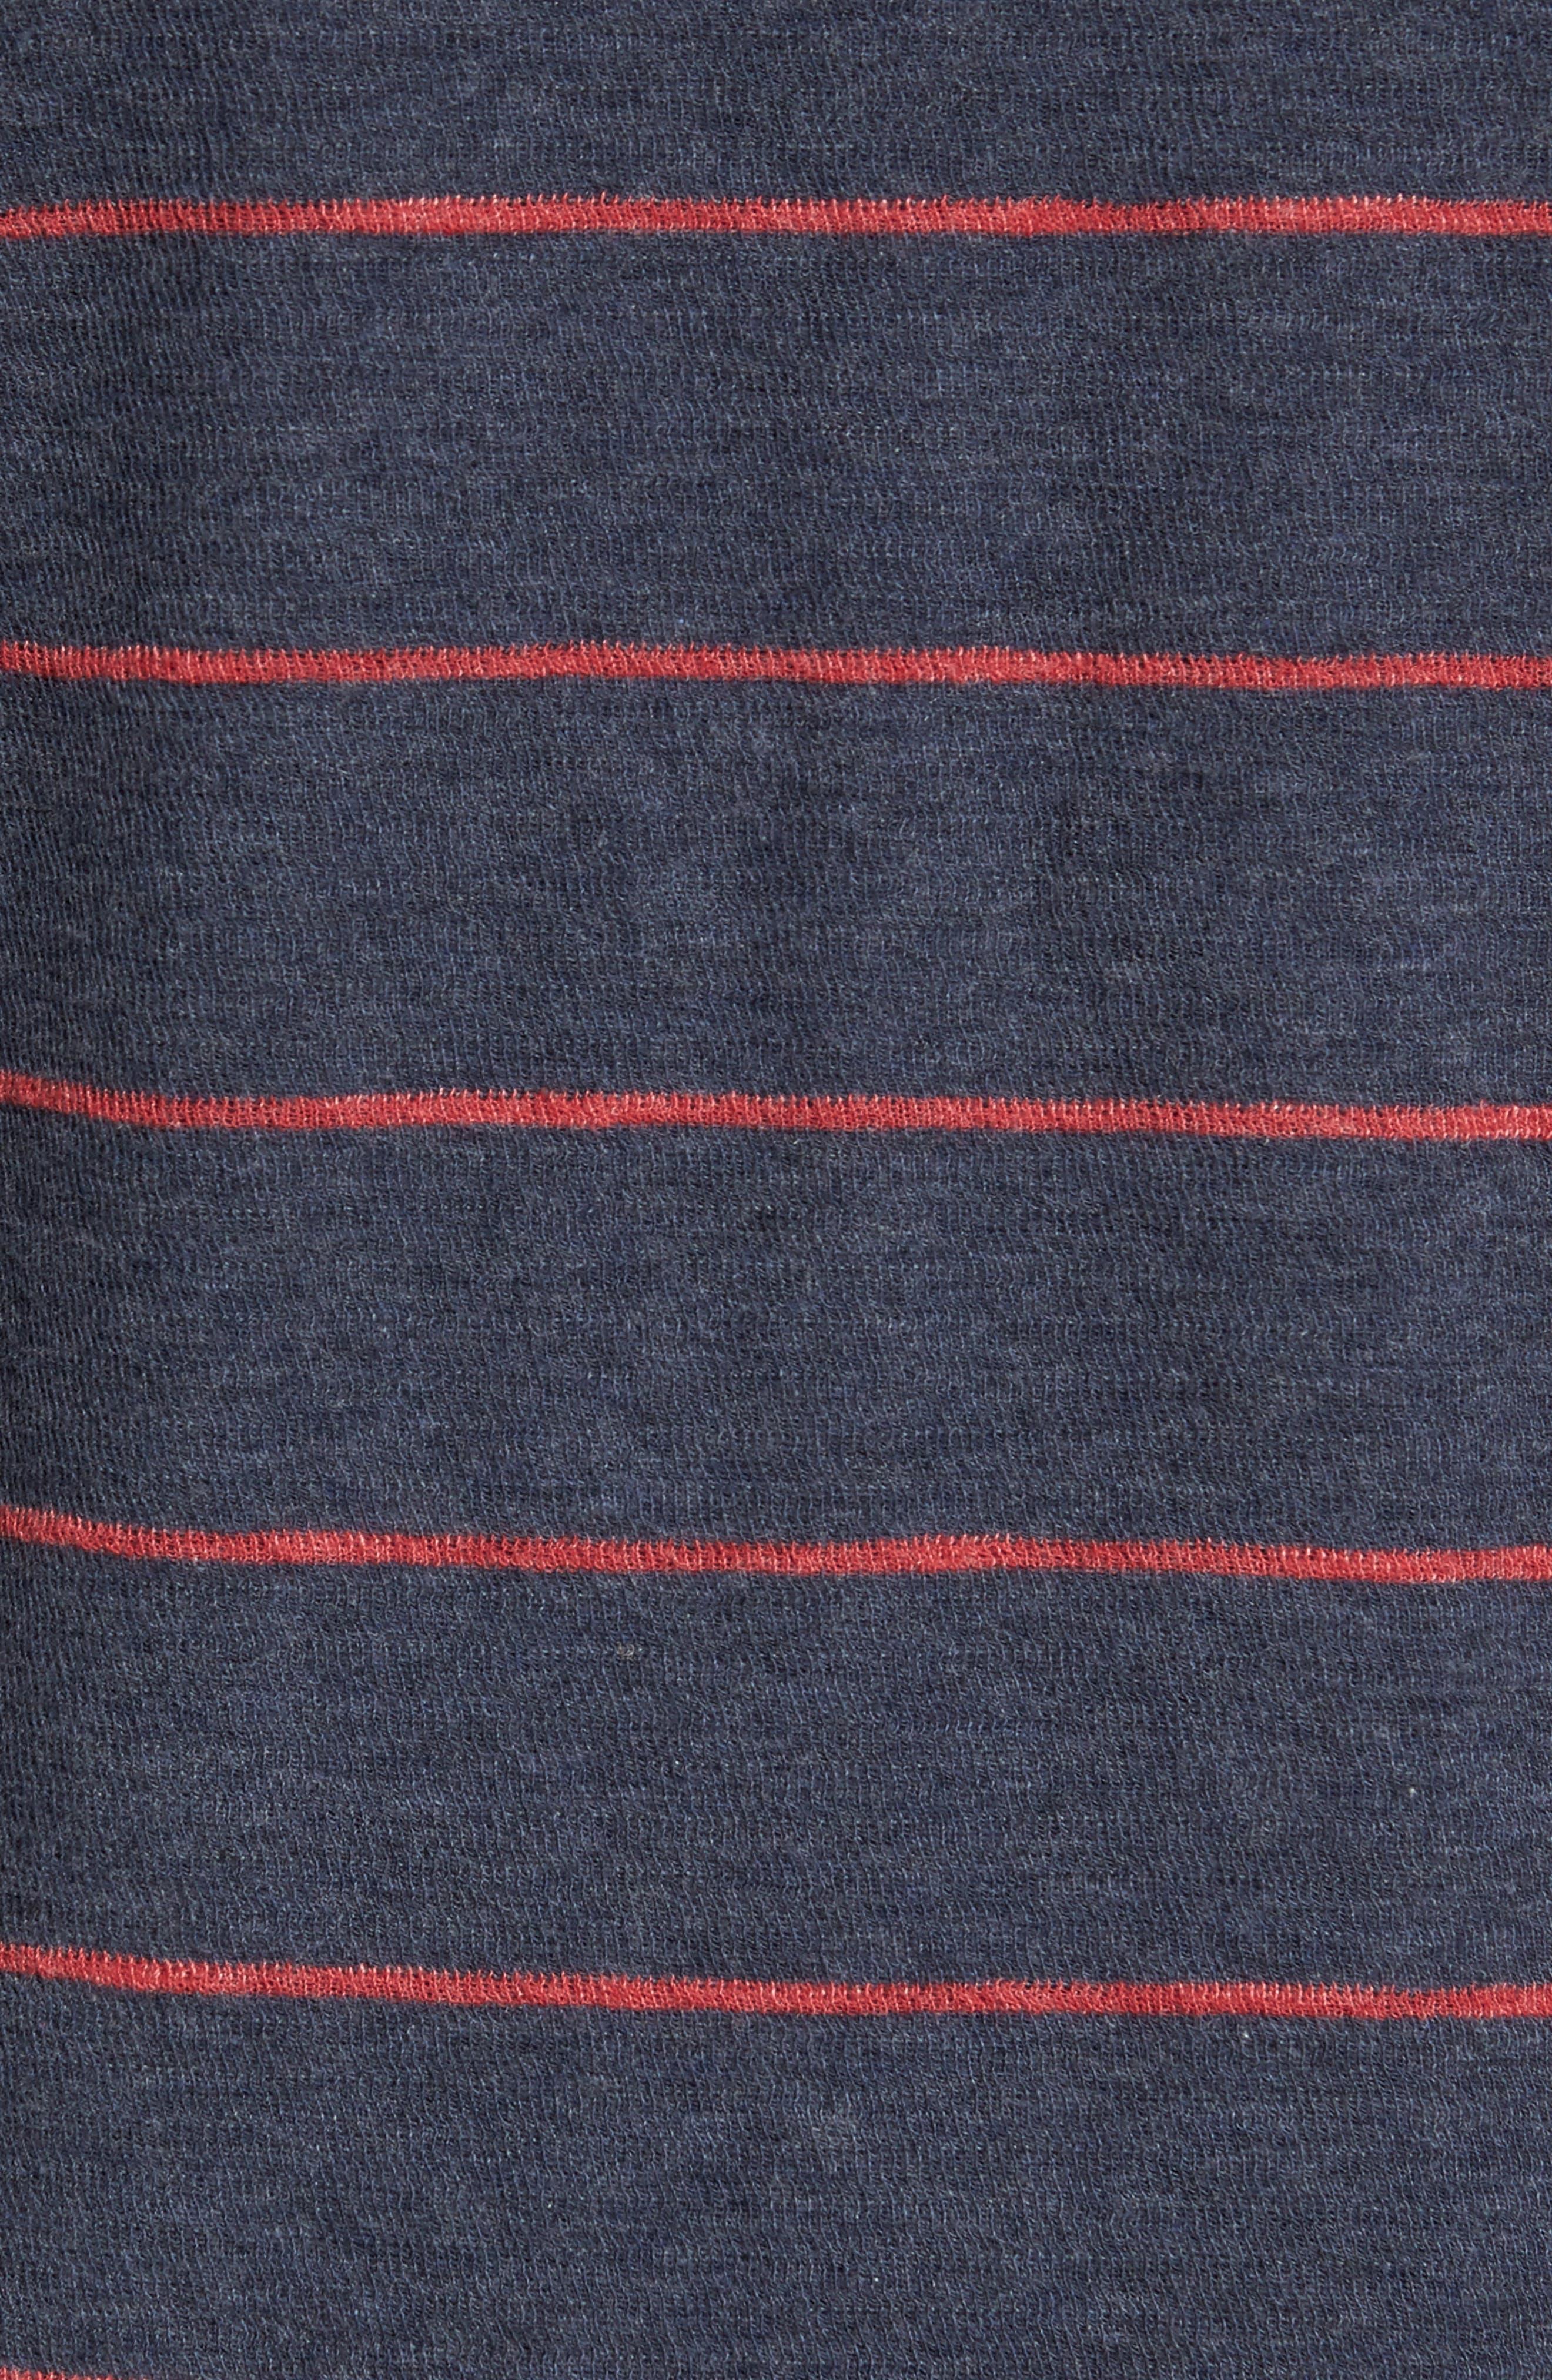 Baird Stripe Crewneck Sweatshirt,                             Alternate thumbnail 5, color,                             412